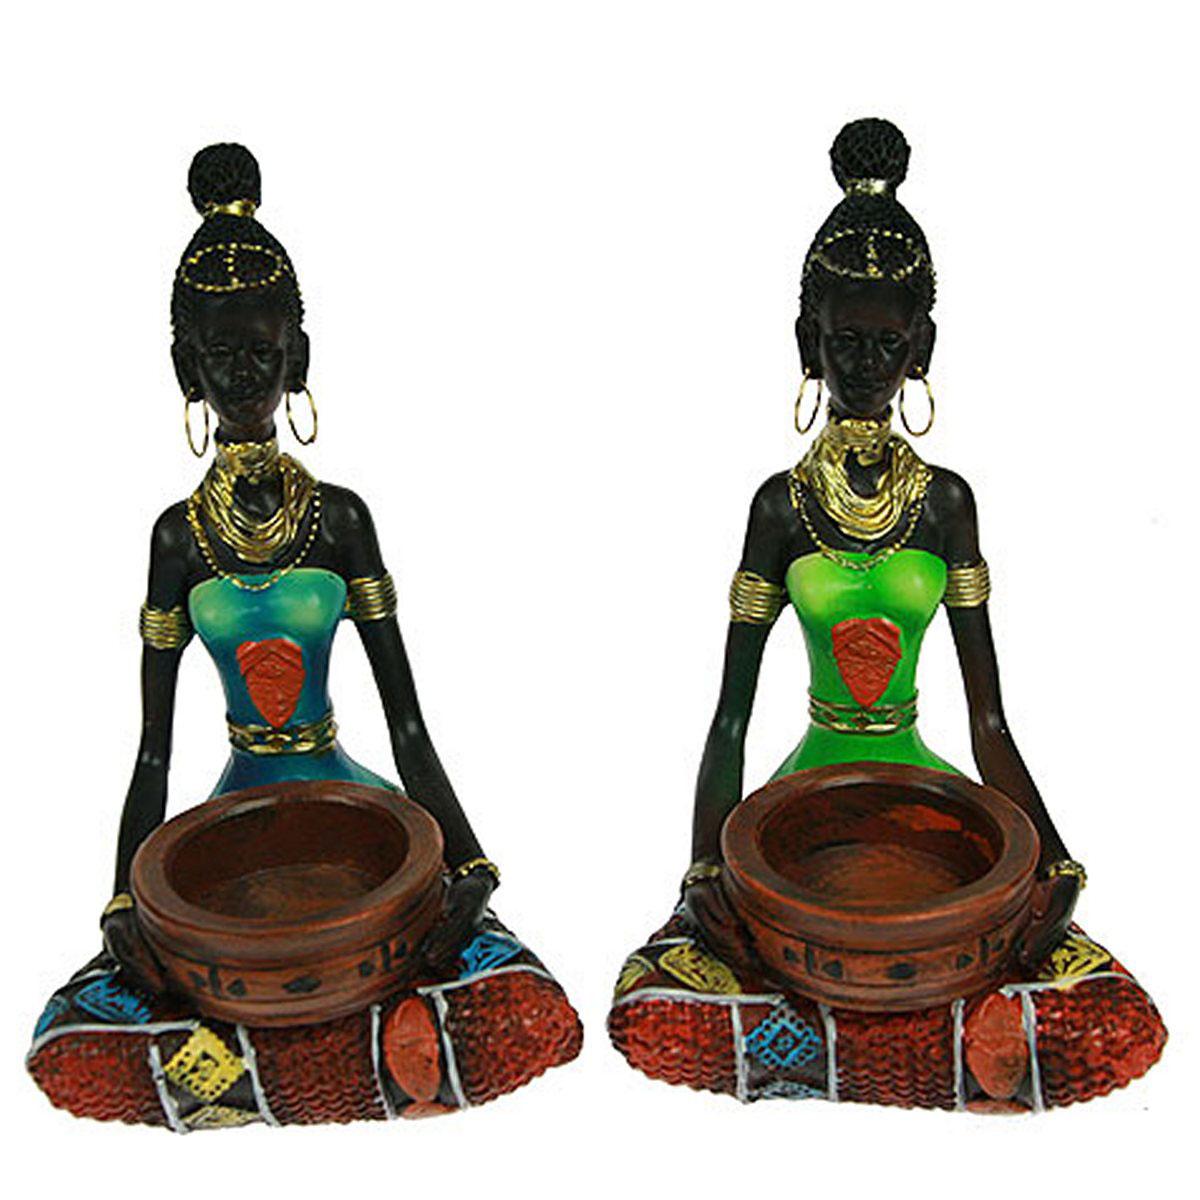 Статуэтка Русские Подарки Африканка, 10 х 10 х 15 см статуэтка lefard африканка 174 311